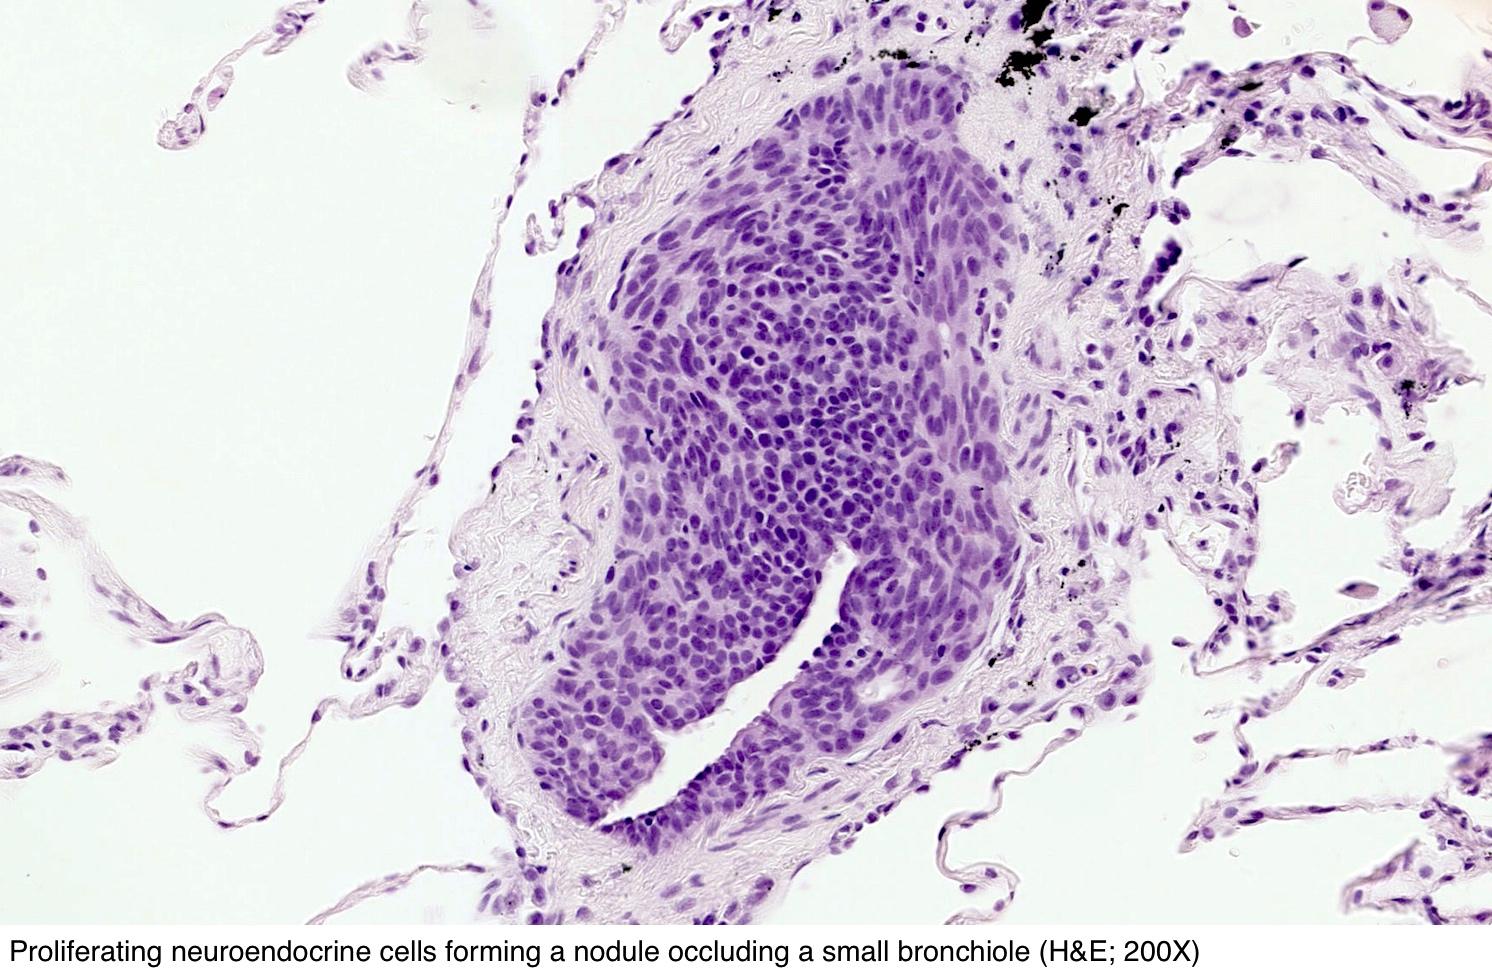 Nodule occluding a bronchiole